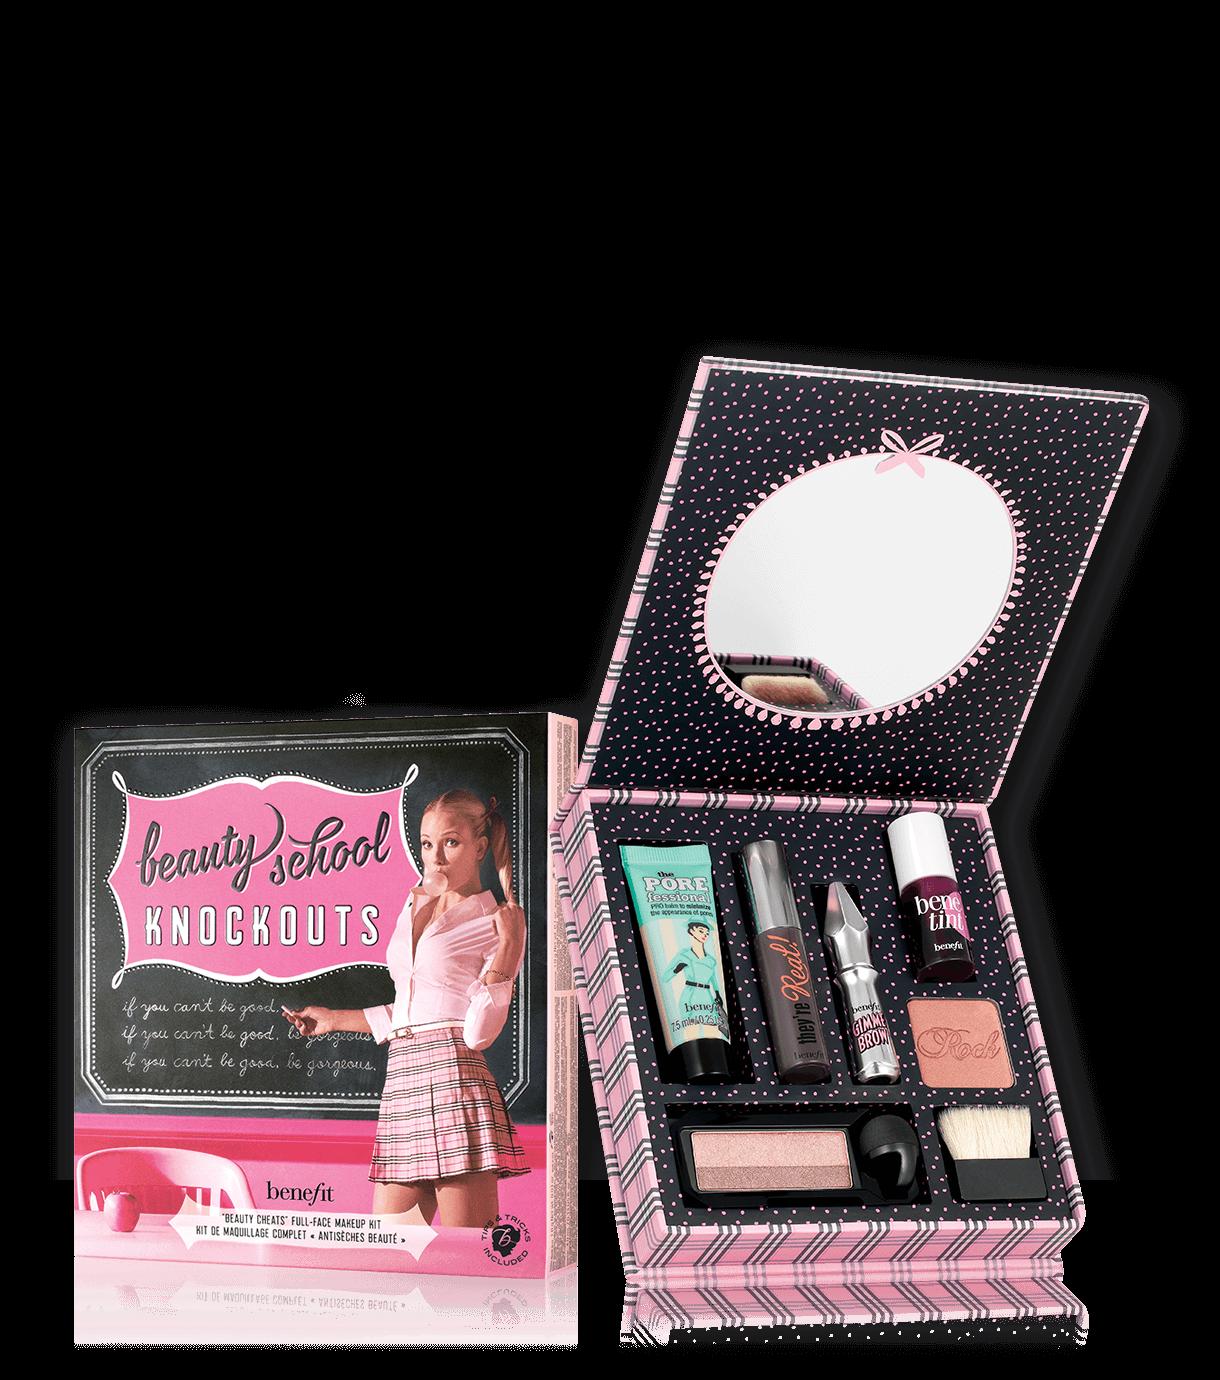 Beauty school knockouts Face makeup kit, Benefit